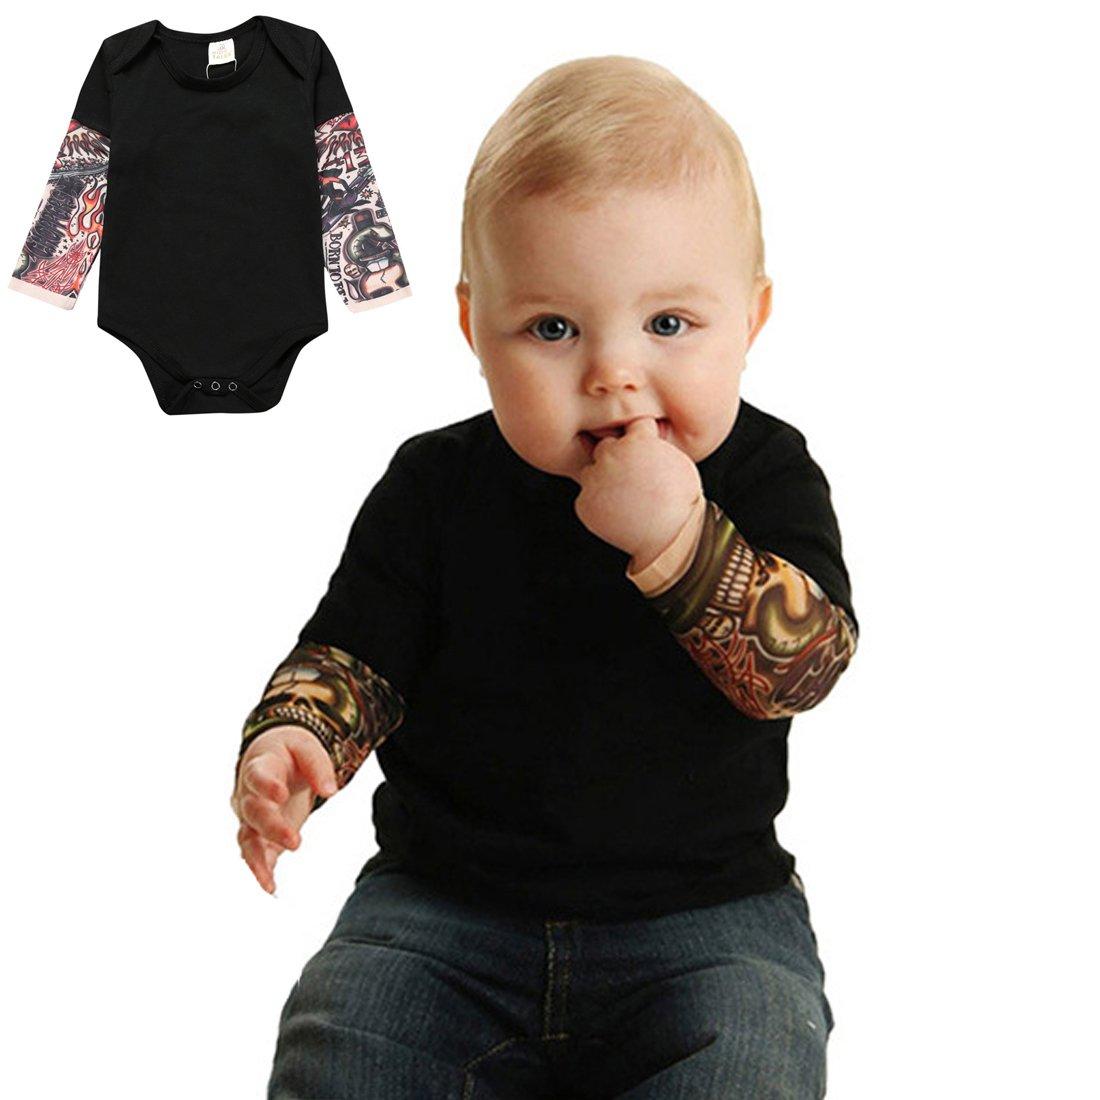 Amazon.com  PAUBOLI Fake Tattoo Sleeve Shirt Onesie Bodysuit Baby Boy Biker  Costume Gray Black  Clothing 88a64a7e3